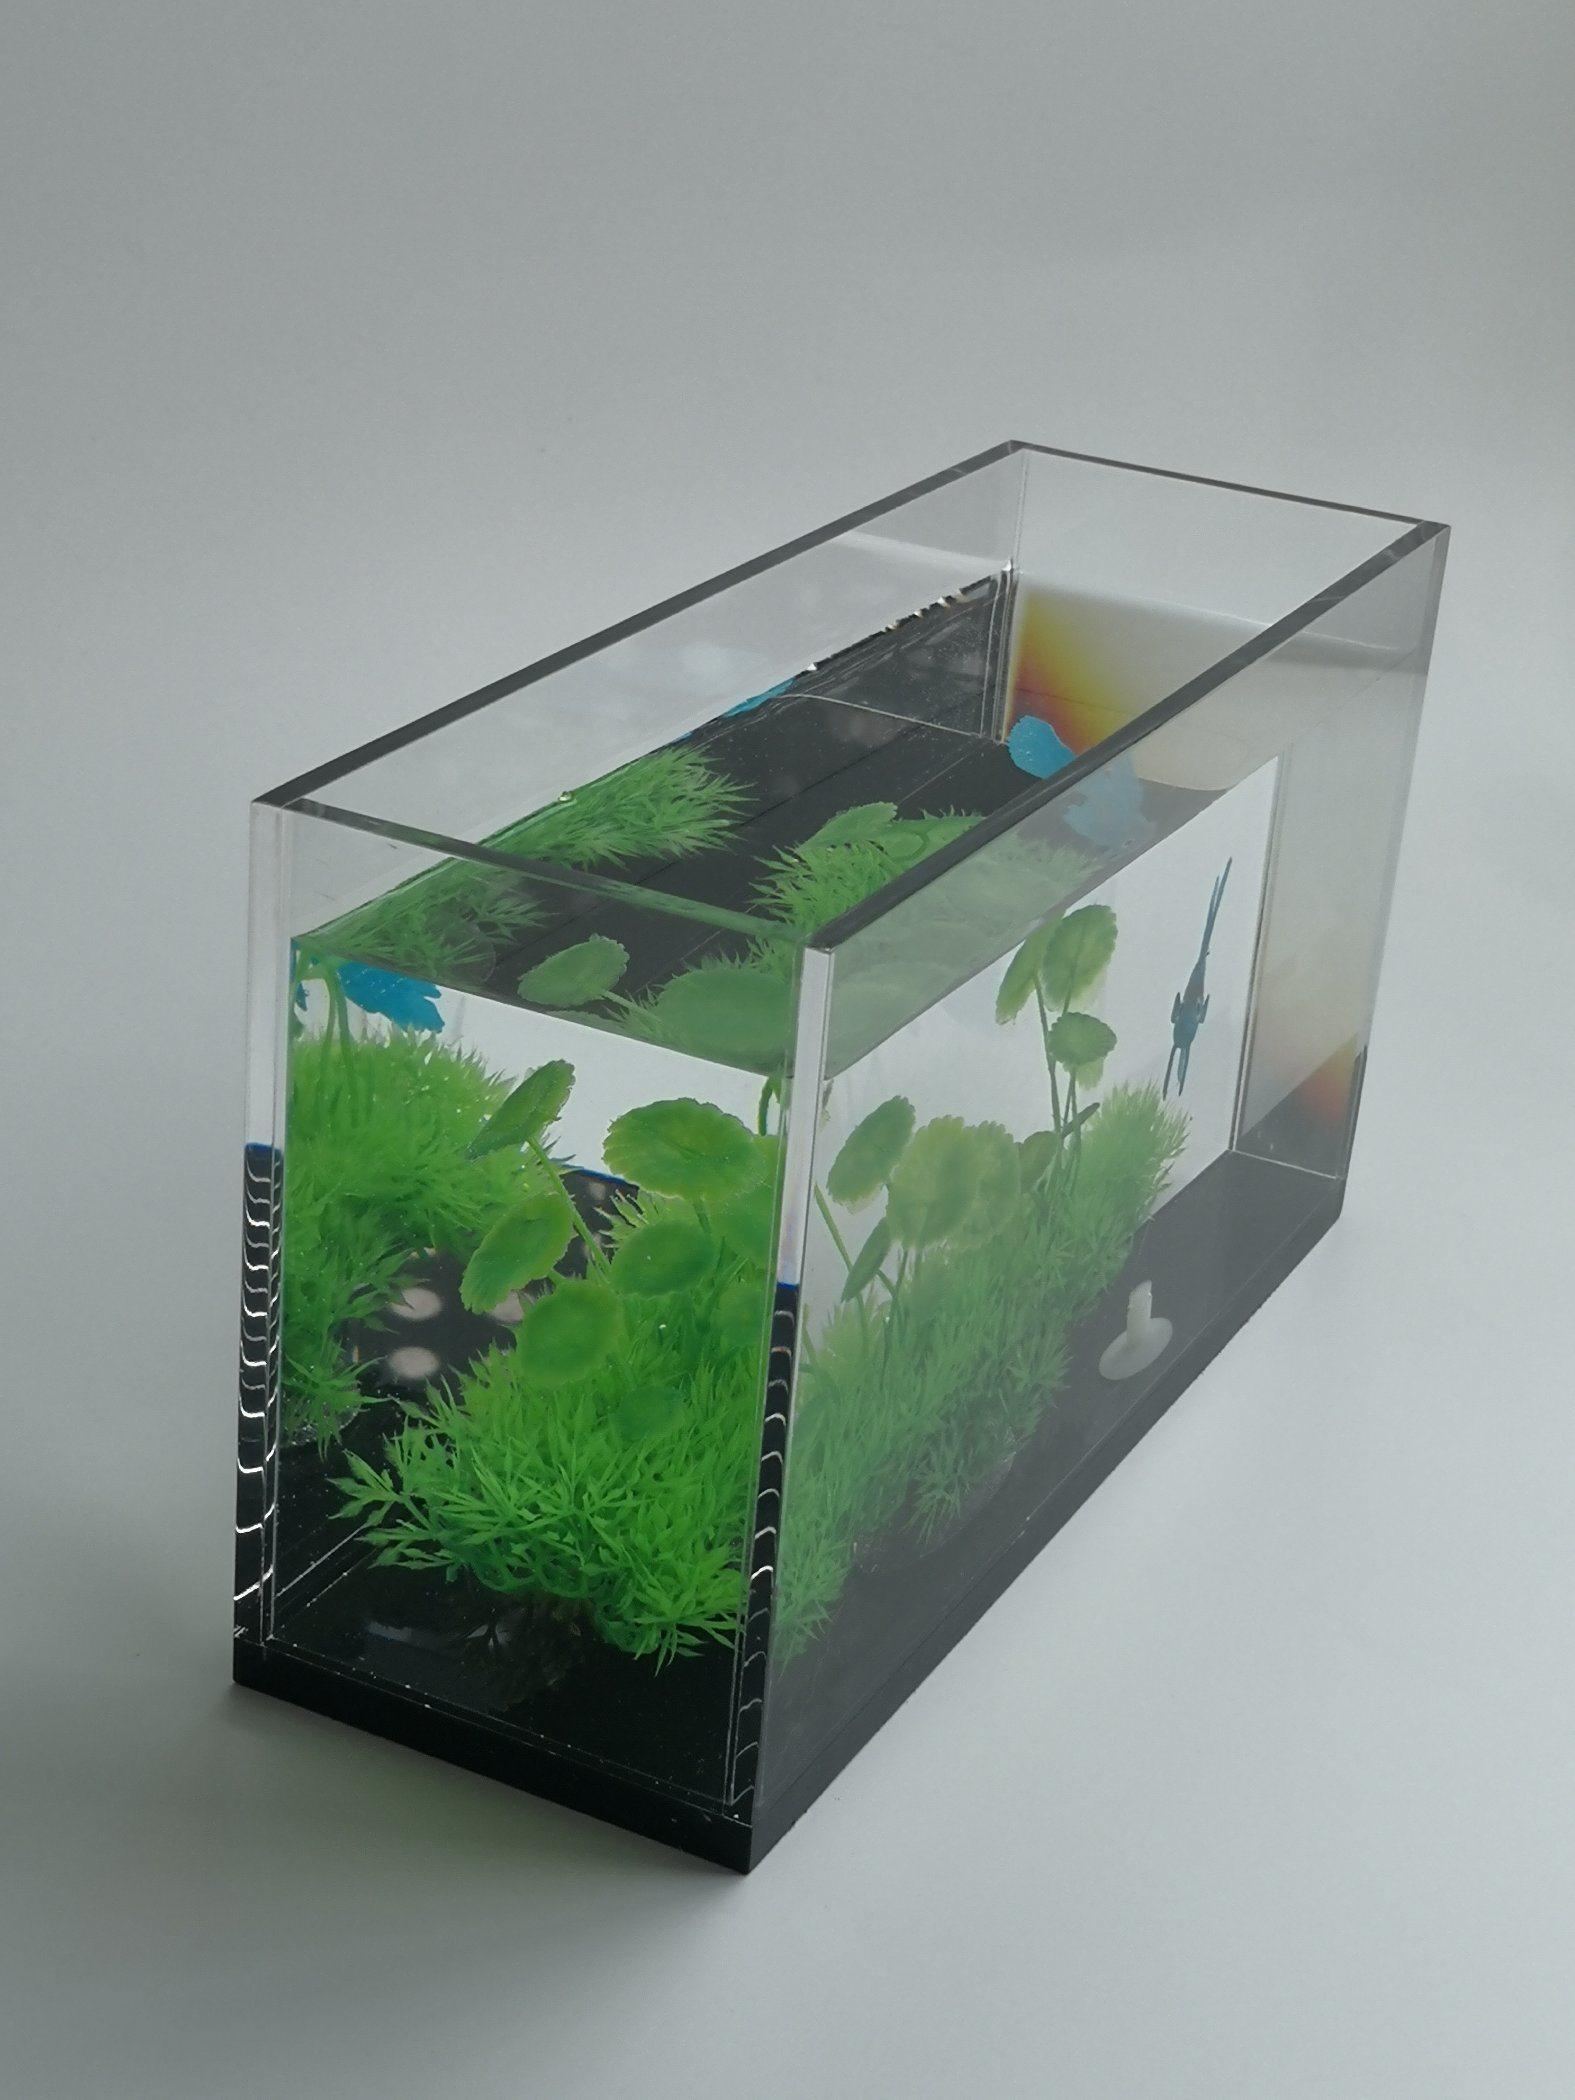 China 2020 Acrylic Fish Tank Bowl Aquarium Square Quadrate Fish Tank Mini Fish Tank China Acrylic Square Aquarium And Acrylic Aquarium Price